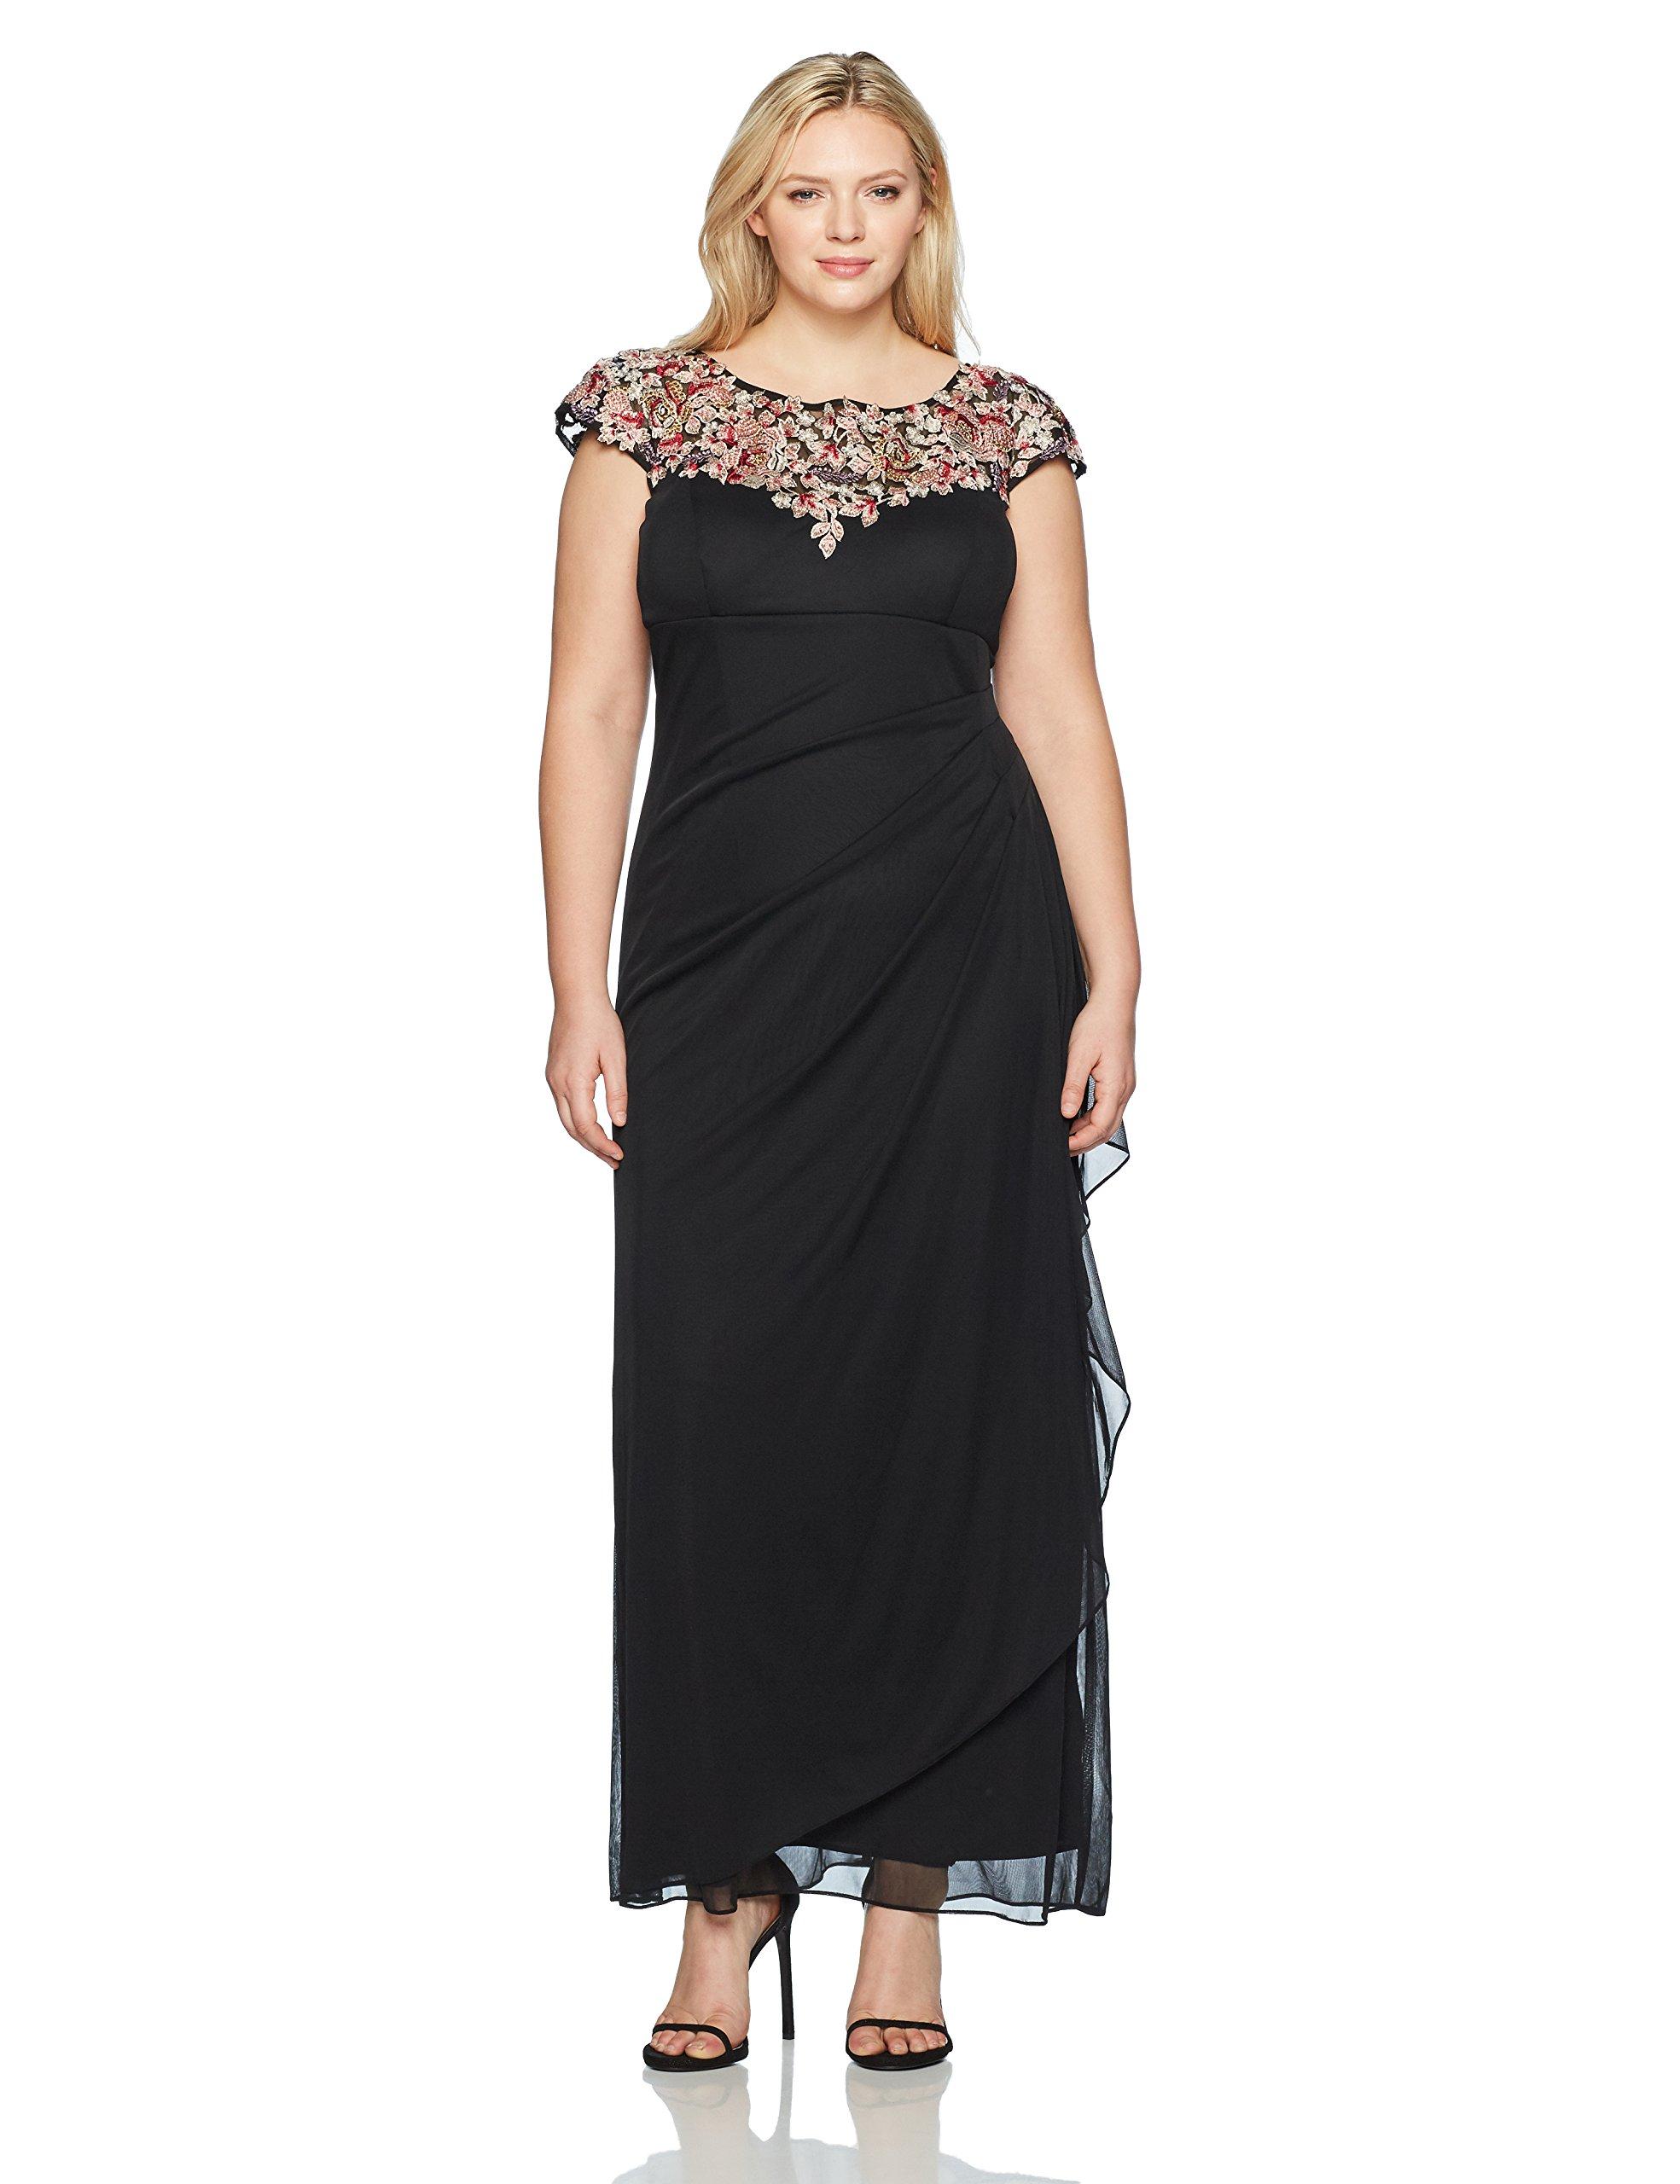 Xscape Women's Plus Size Long Top Embroidery Dress, Black/Multi, 18W